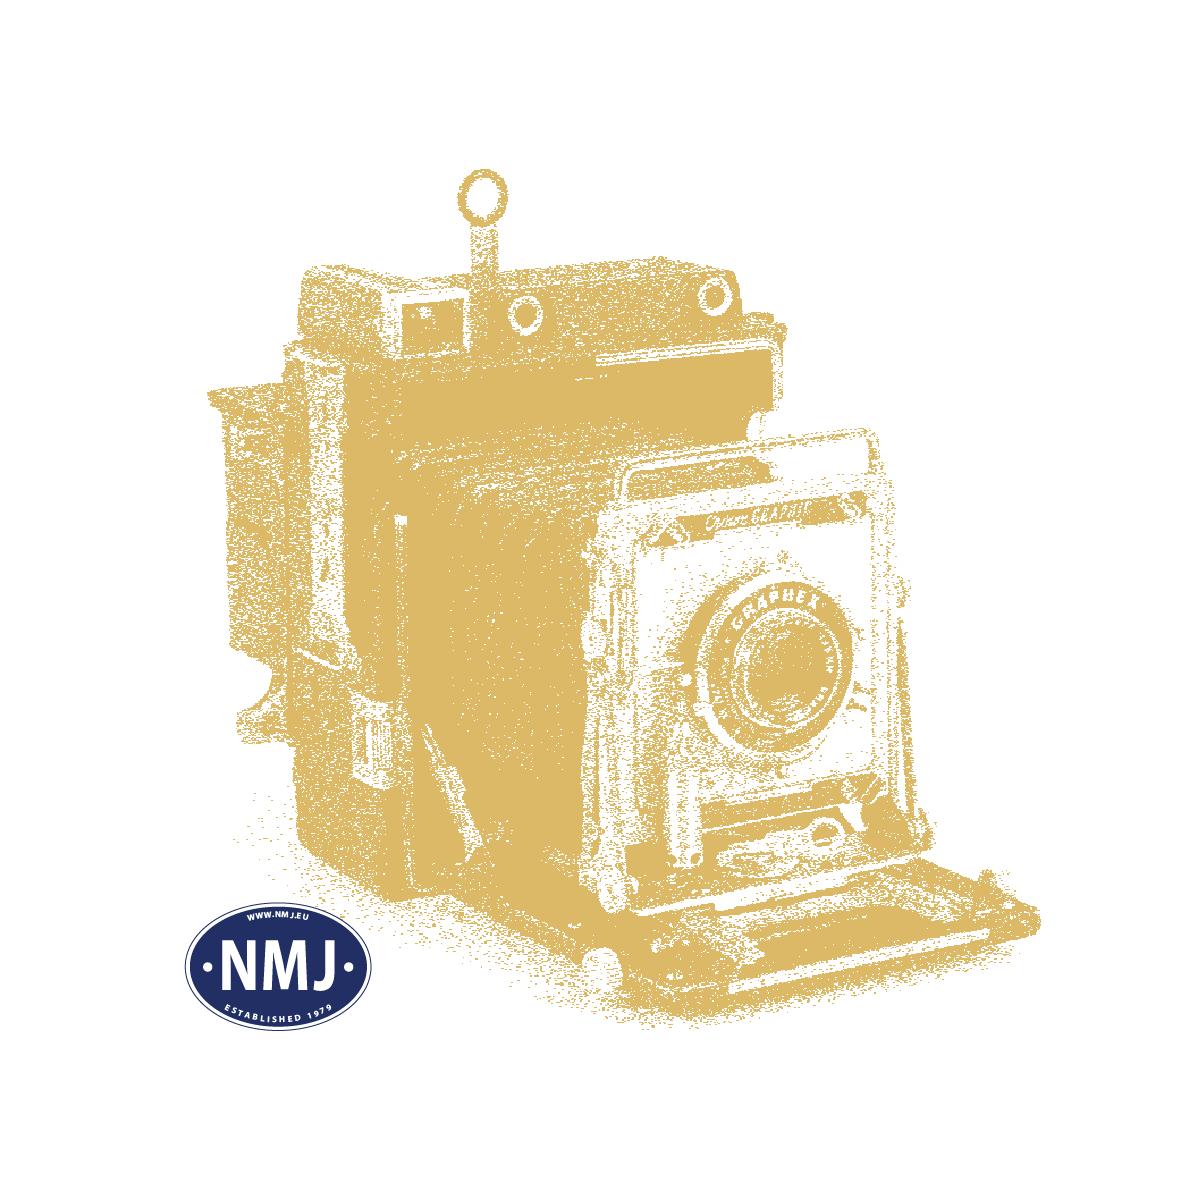 MBR55-1014 - Gressmatte #14, 30 x 40 Cm